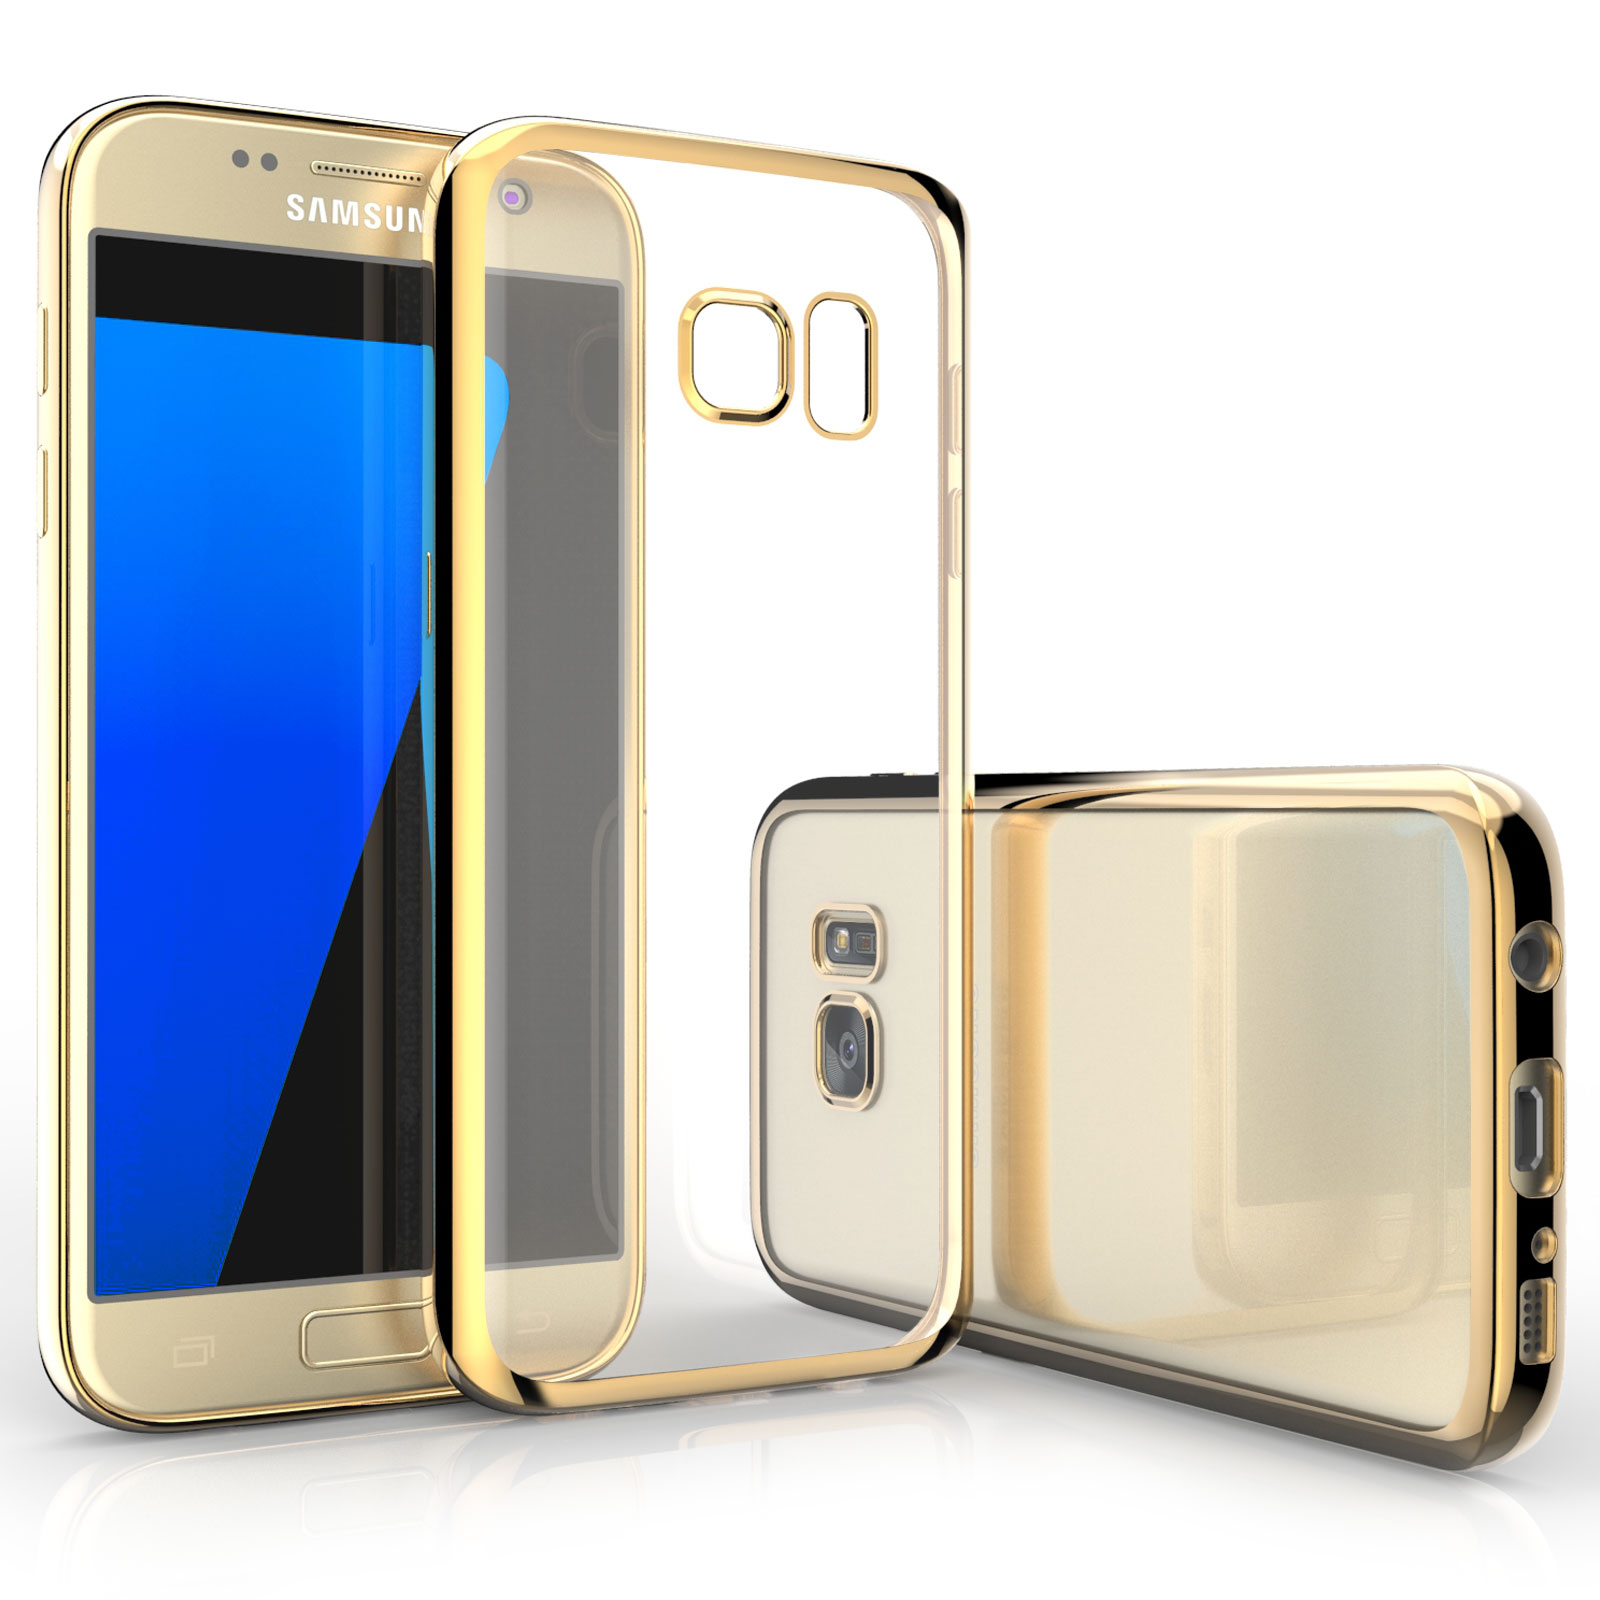 Caseflex Ultra-Thin Διάφανη Θήκη Σιλικόνης με Χρυσό Bumper Samsung Galaxy S7 (Z297)